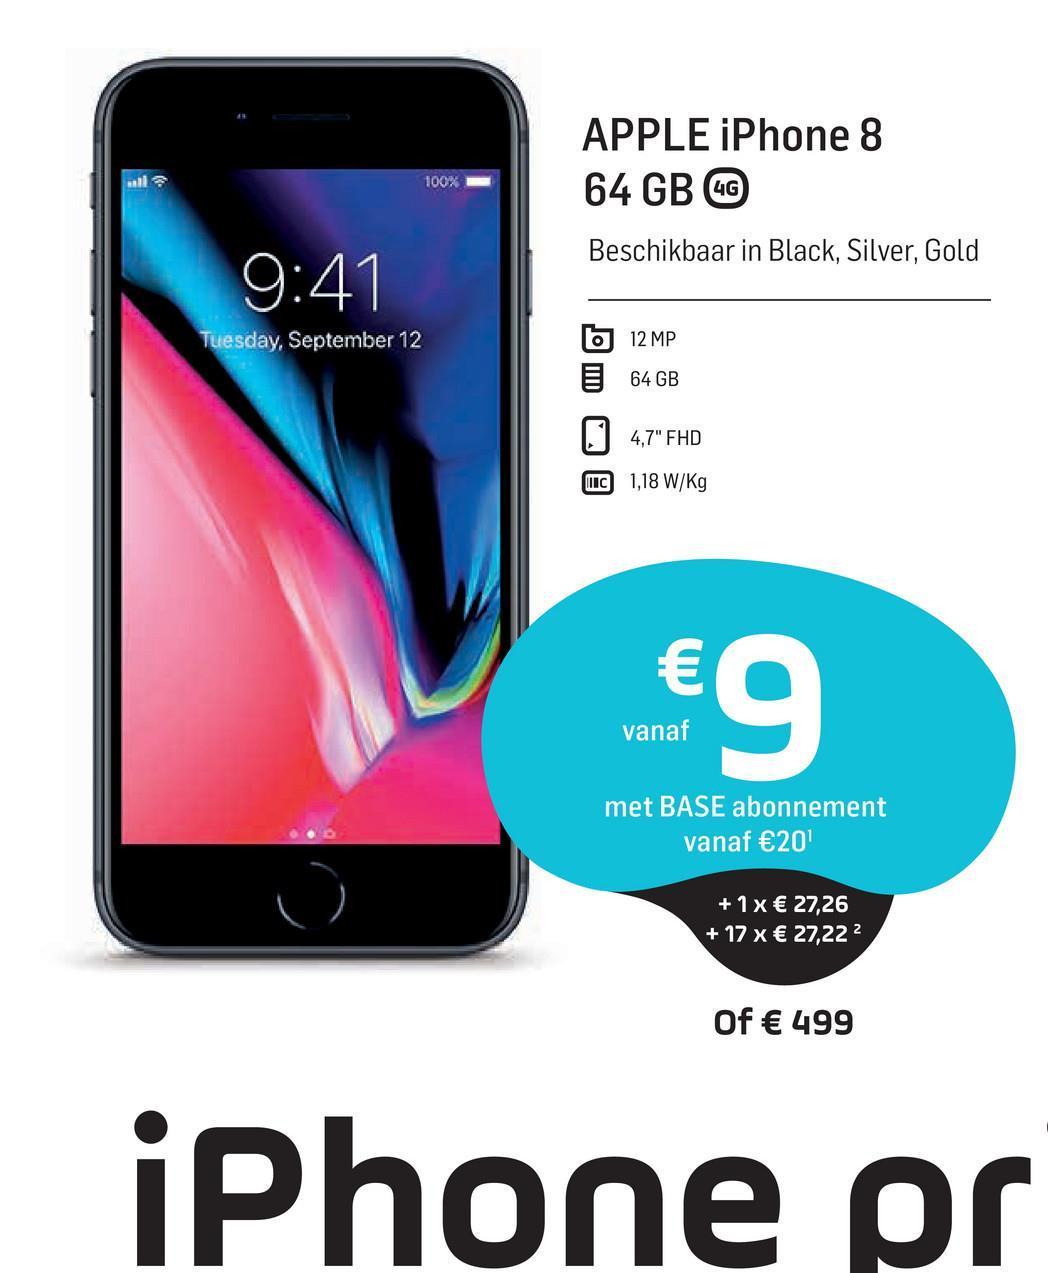 "APPLE iPhone 8 64 GB GO 100% Beschikbaar in Black, Silver, Gold 9:41 Tuesday, September 12 12 MP 64 GB 4,7"" FHD IC 1,18 W/Kg € o vanaf met BASE abonnement vanaf €20 + 1x € 27,26 + 17 x € 27,222 Of € 499 iPhone pr"